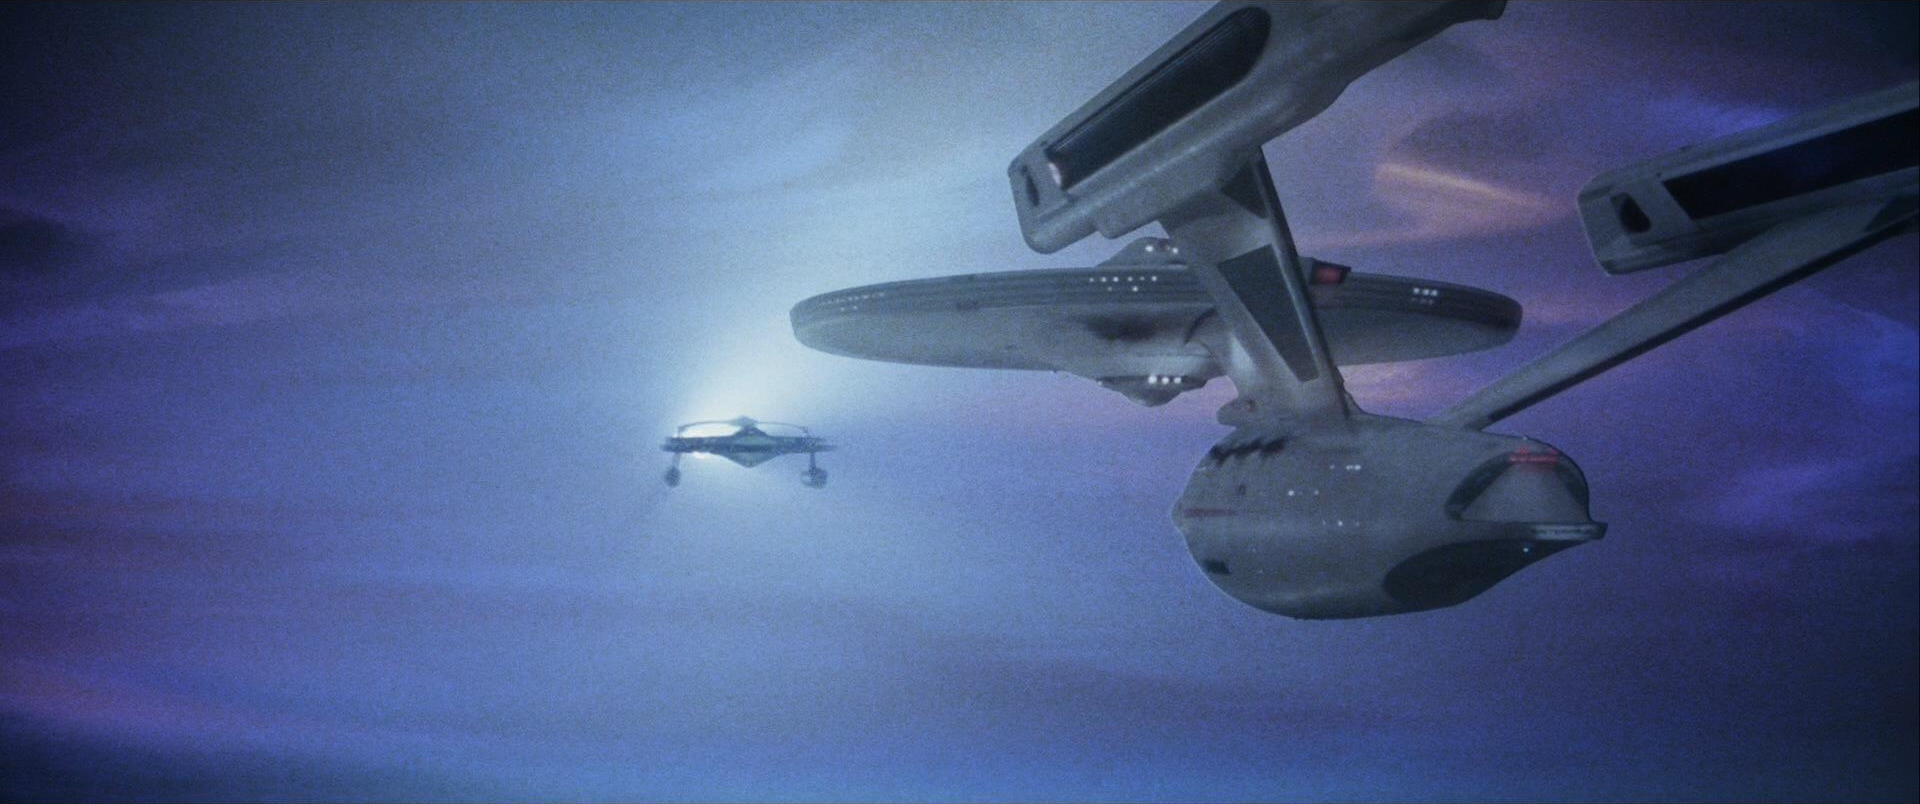 Star Trek: The Wrath of Khan - Enterprise & Reliant